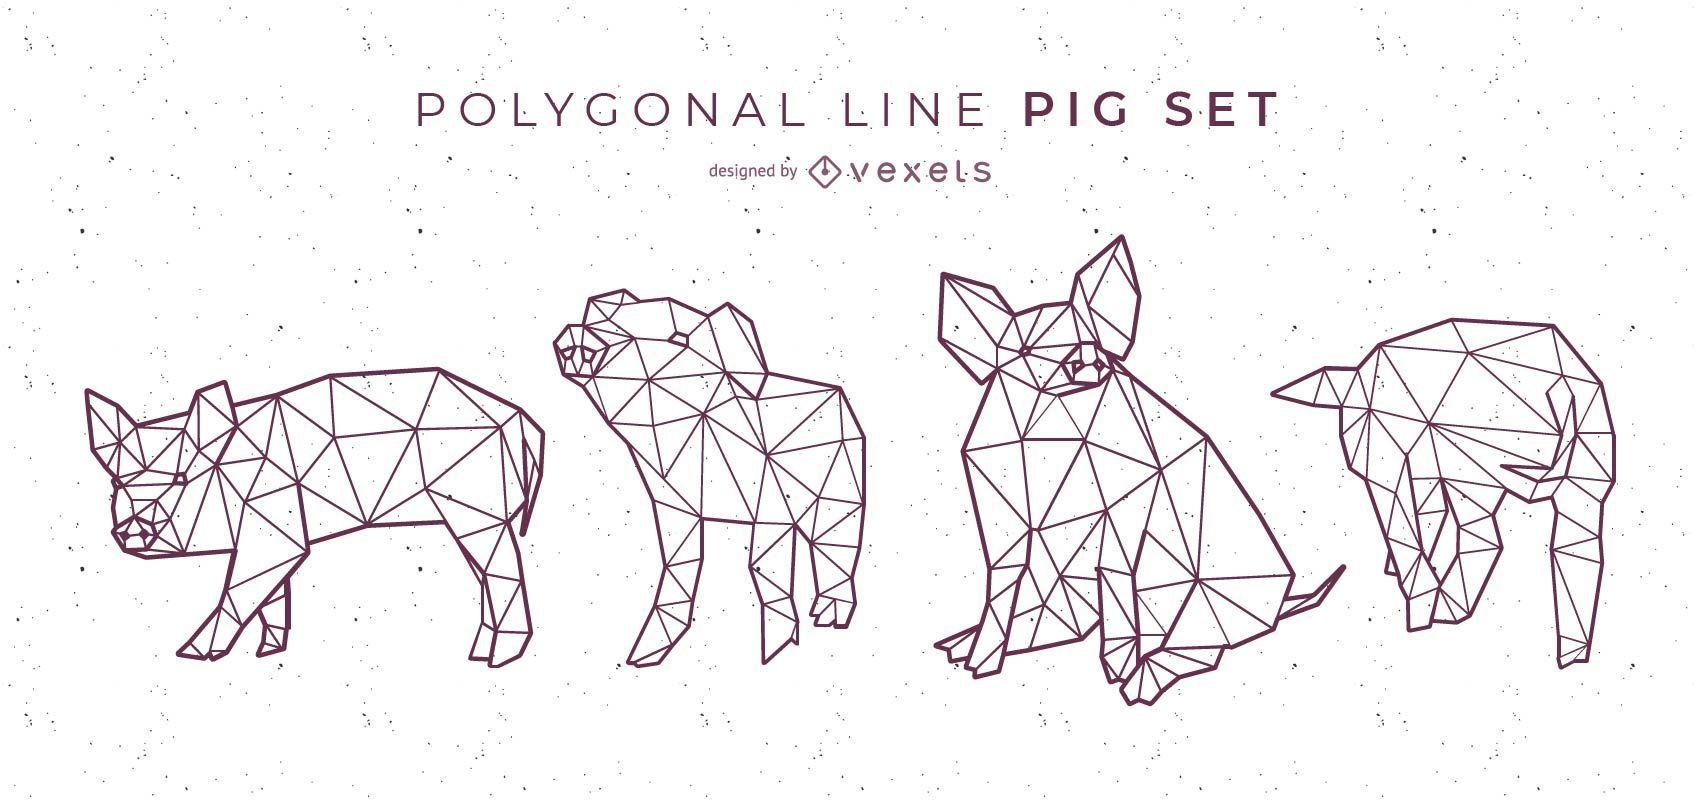 Polygonal Line Pig Set